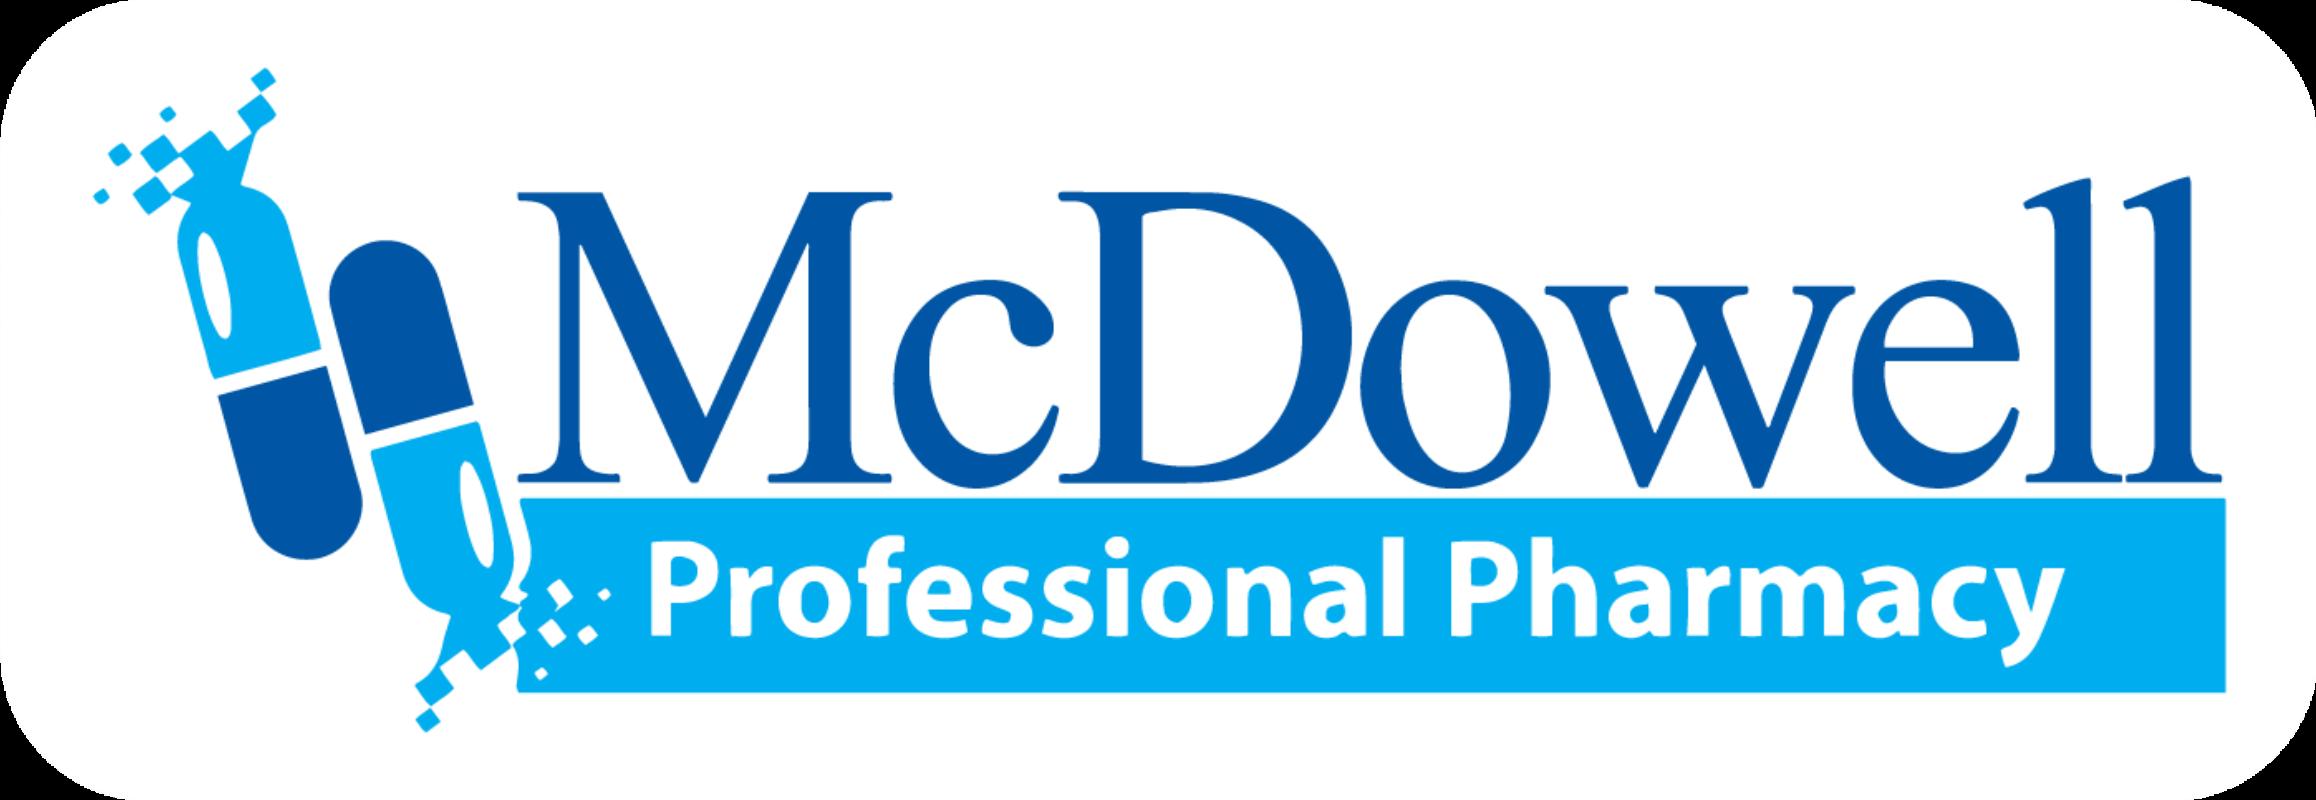 Mcdowell Professional Pharmacy